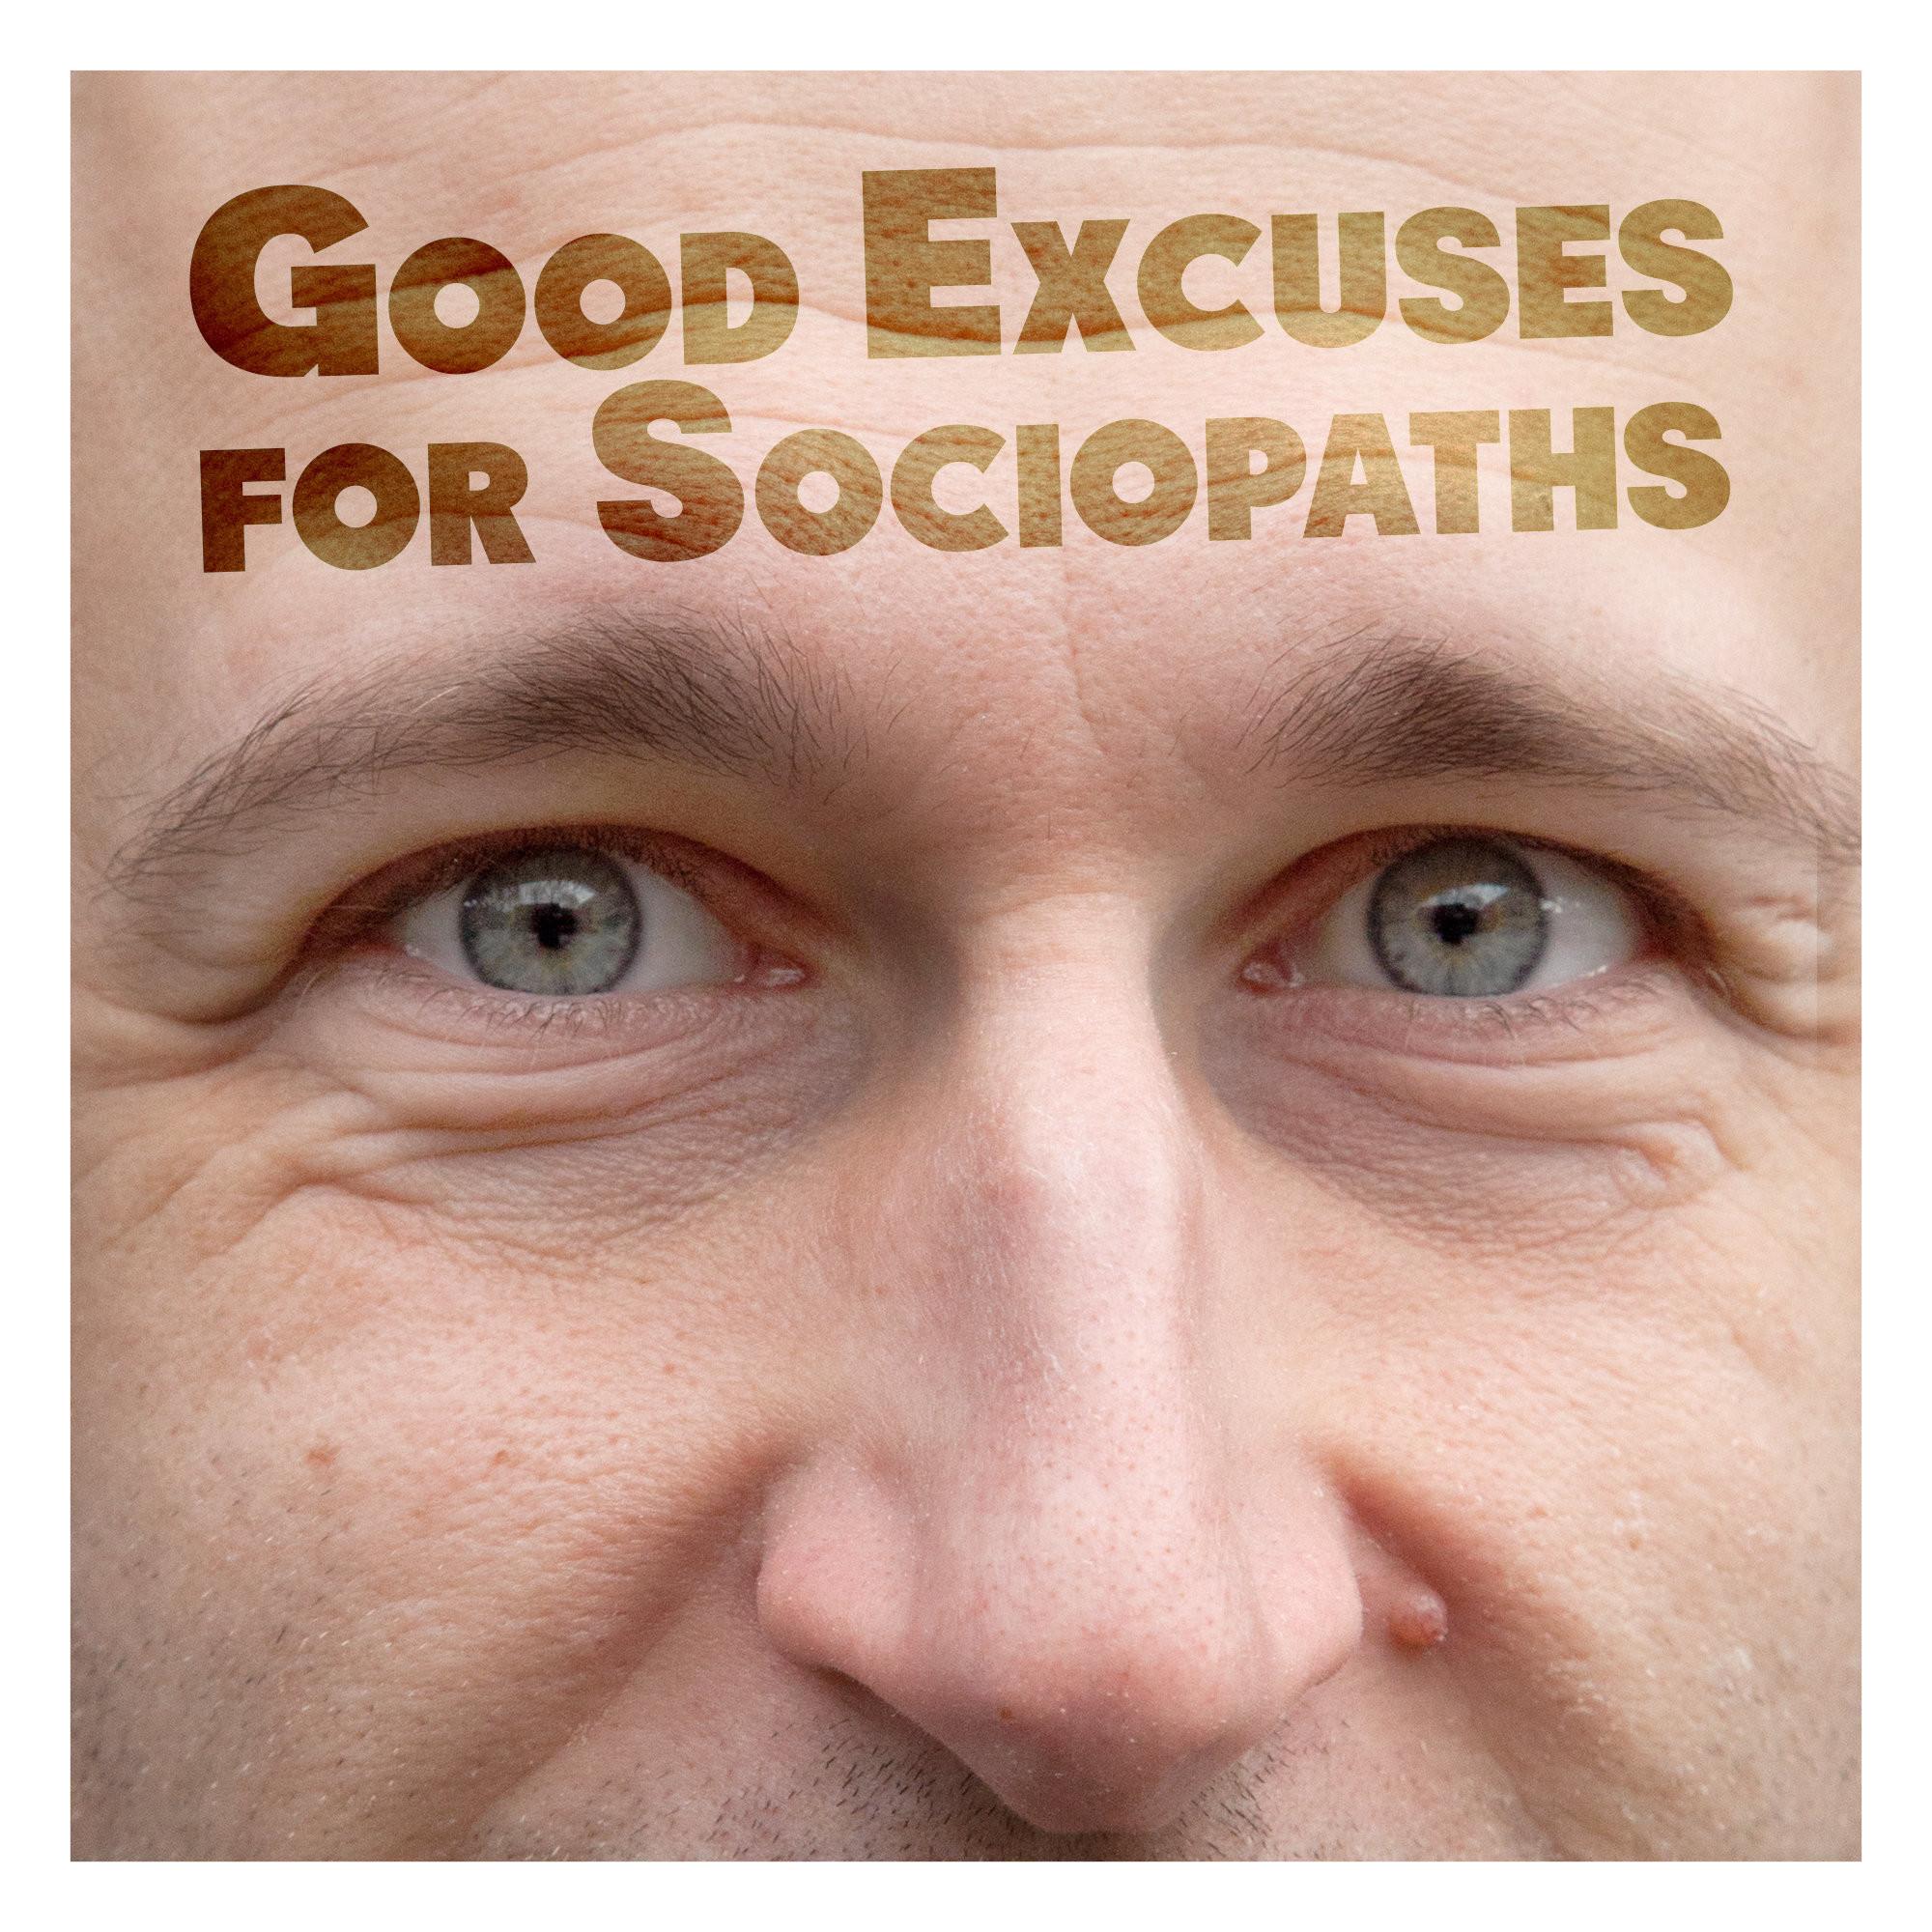 Radu isac good excuses for   sociopaths